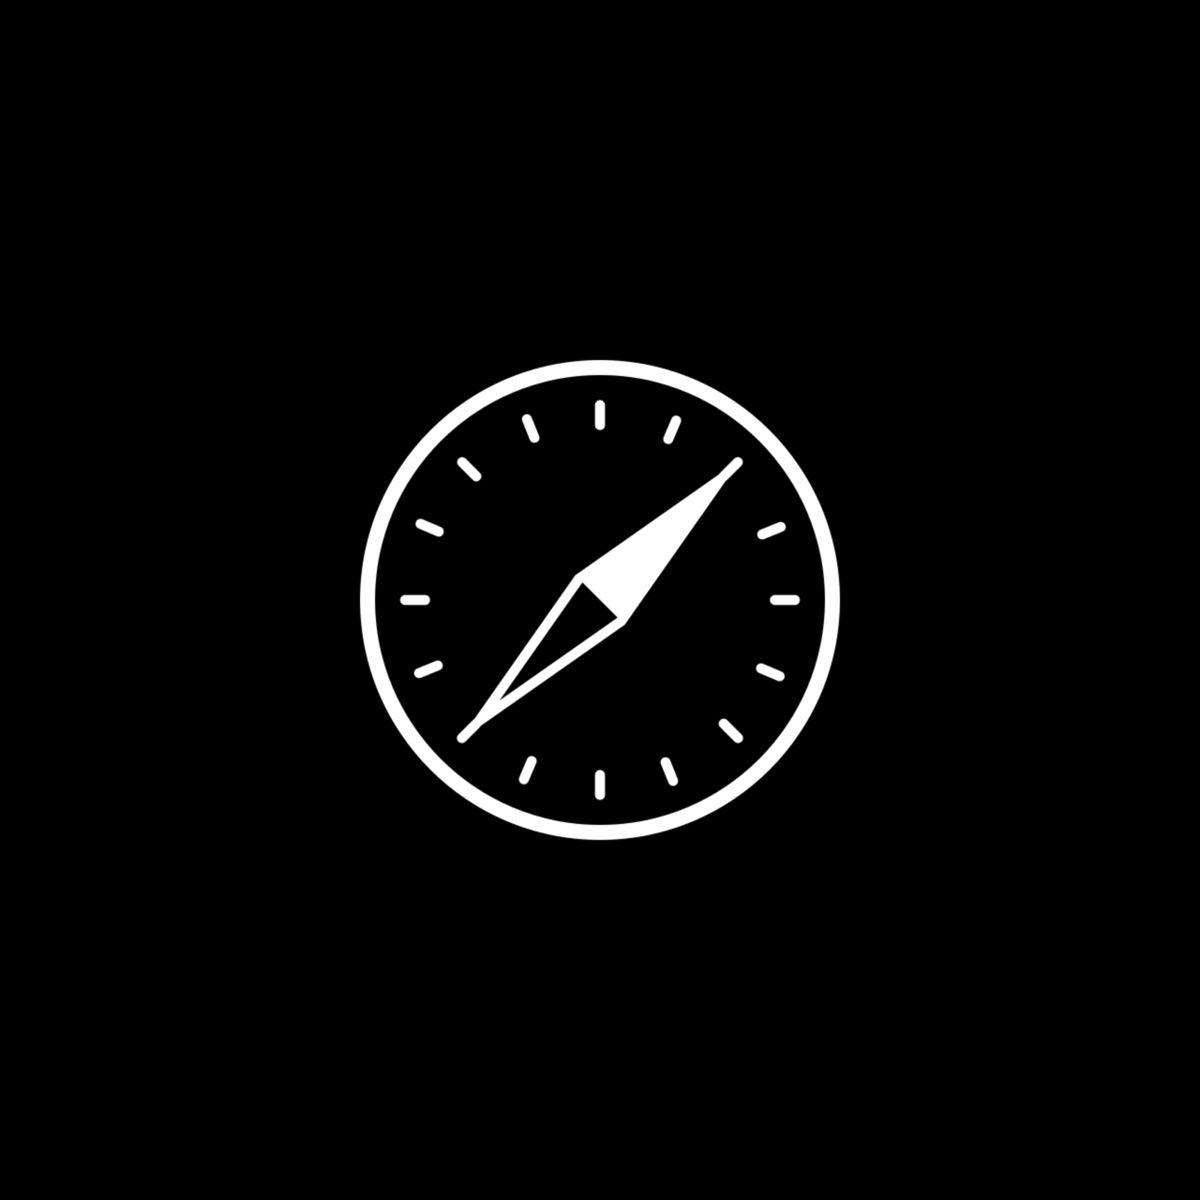 Black Aesthetic Safari App Icon For Ios14 Black App App Icon Ios App Icon Design